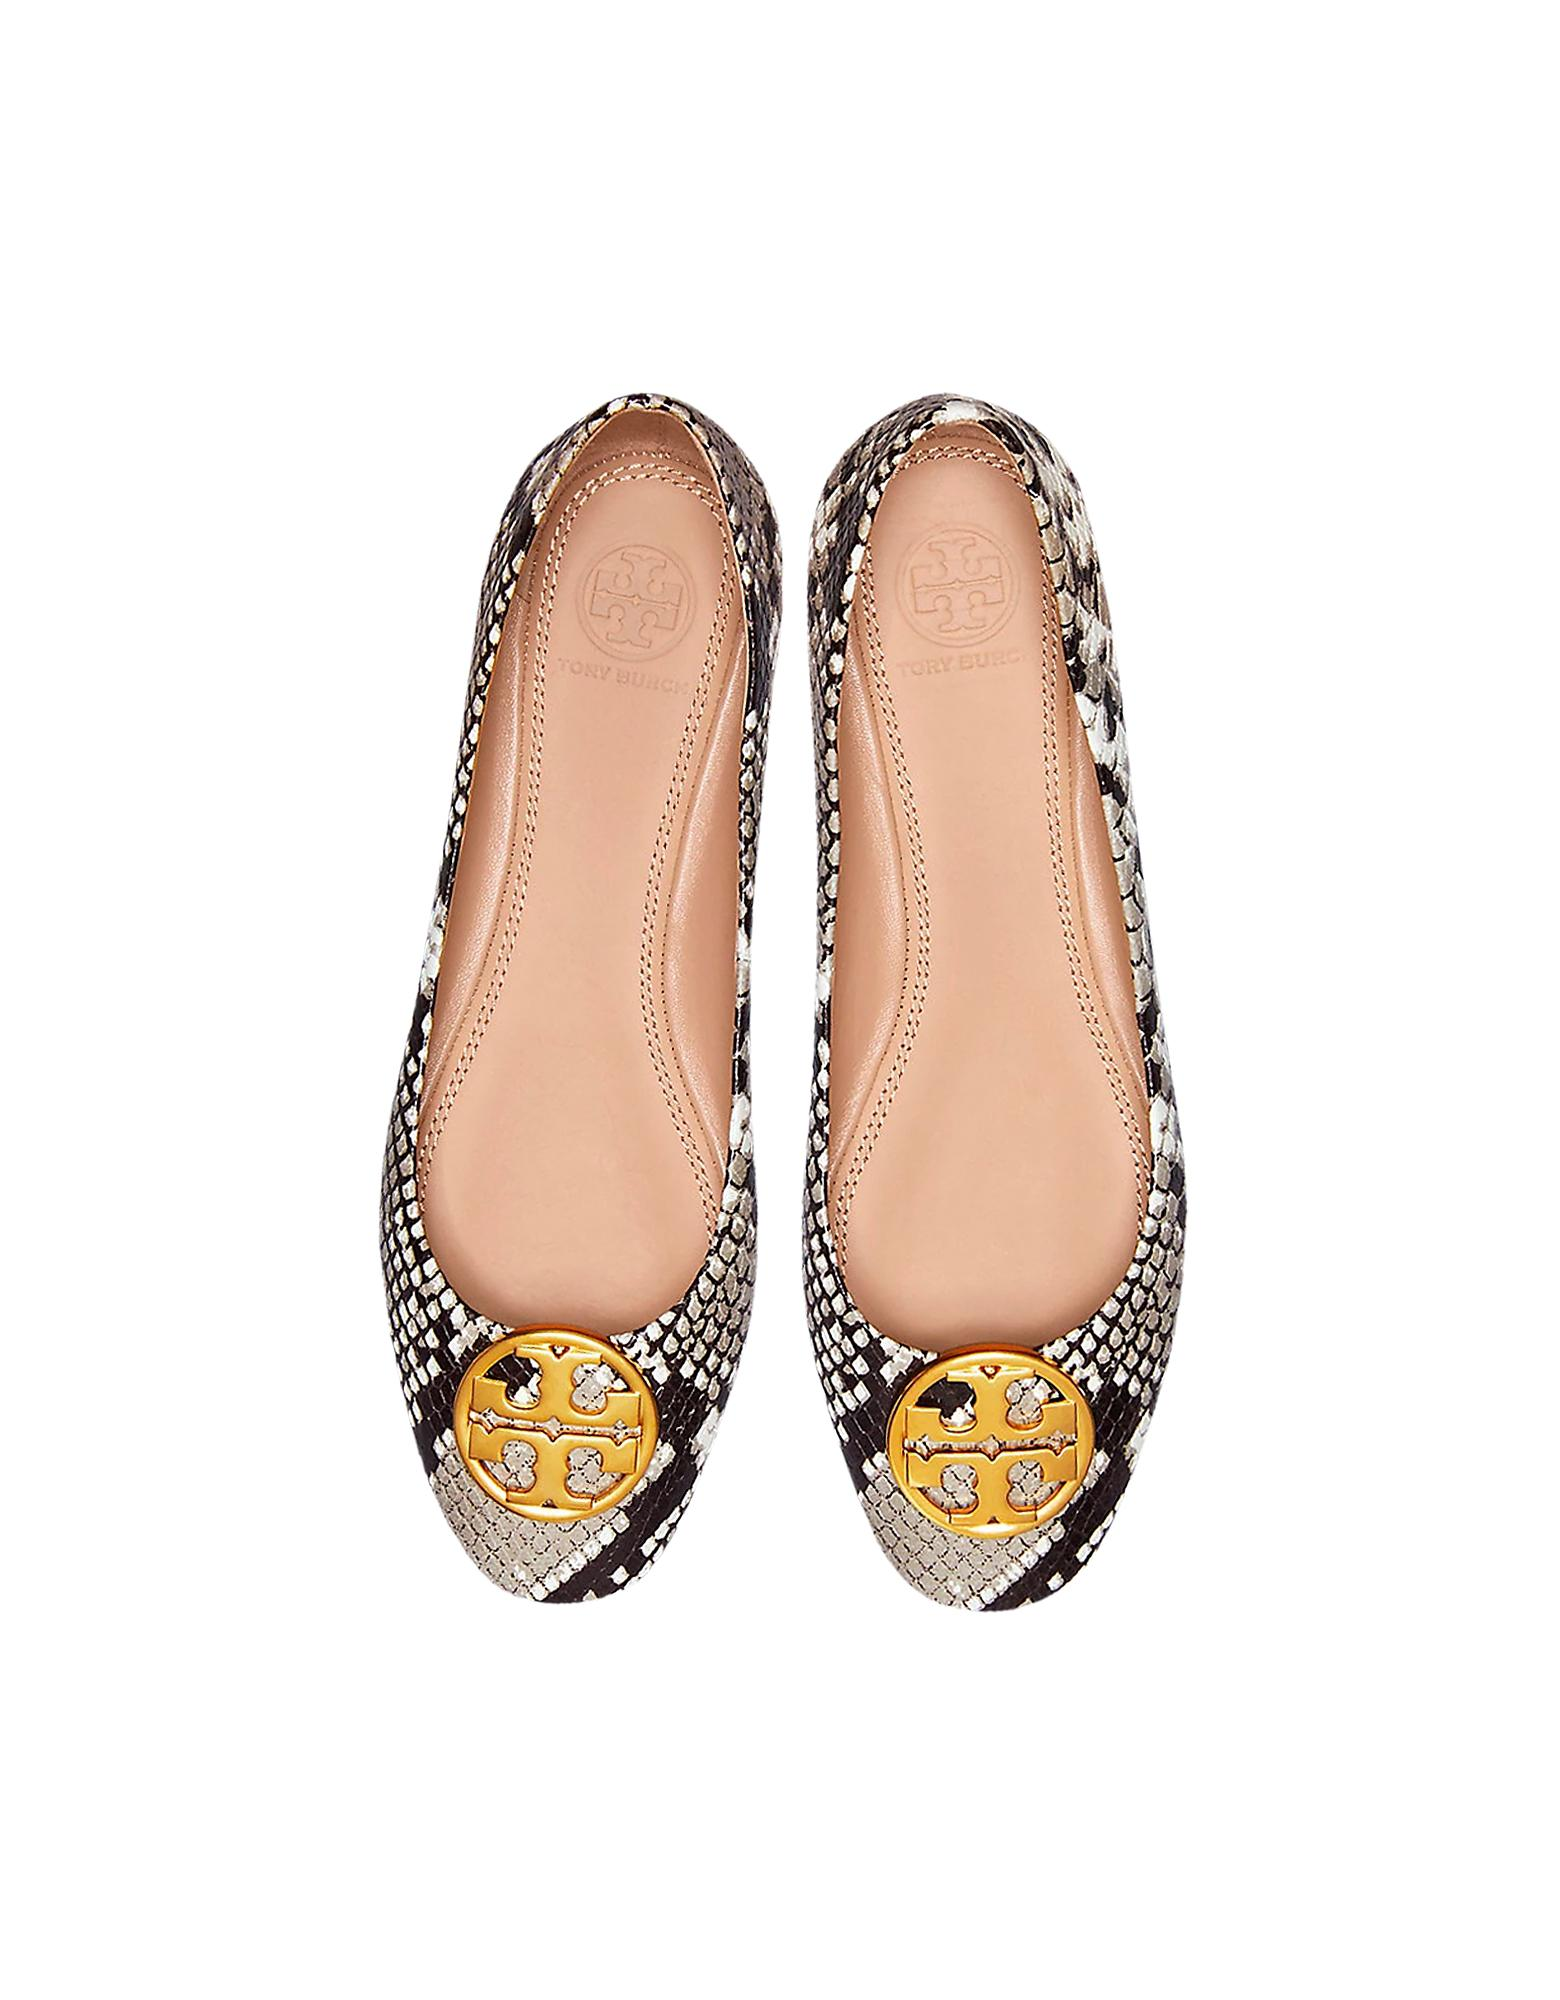 d3dd78f9b8c2 Lyst - Tory Burch Warm Roccia Snake Printed Leather Chelsea Ballet ...